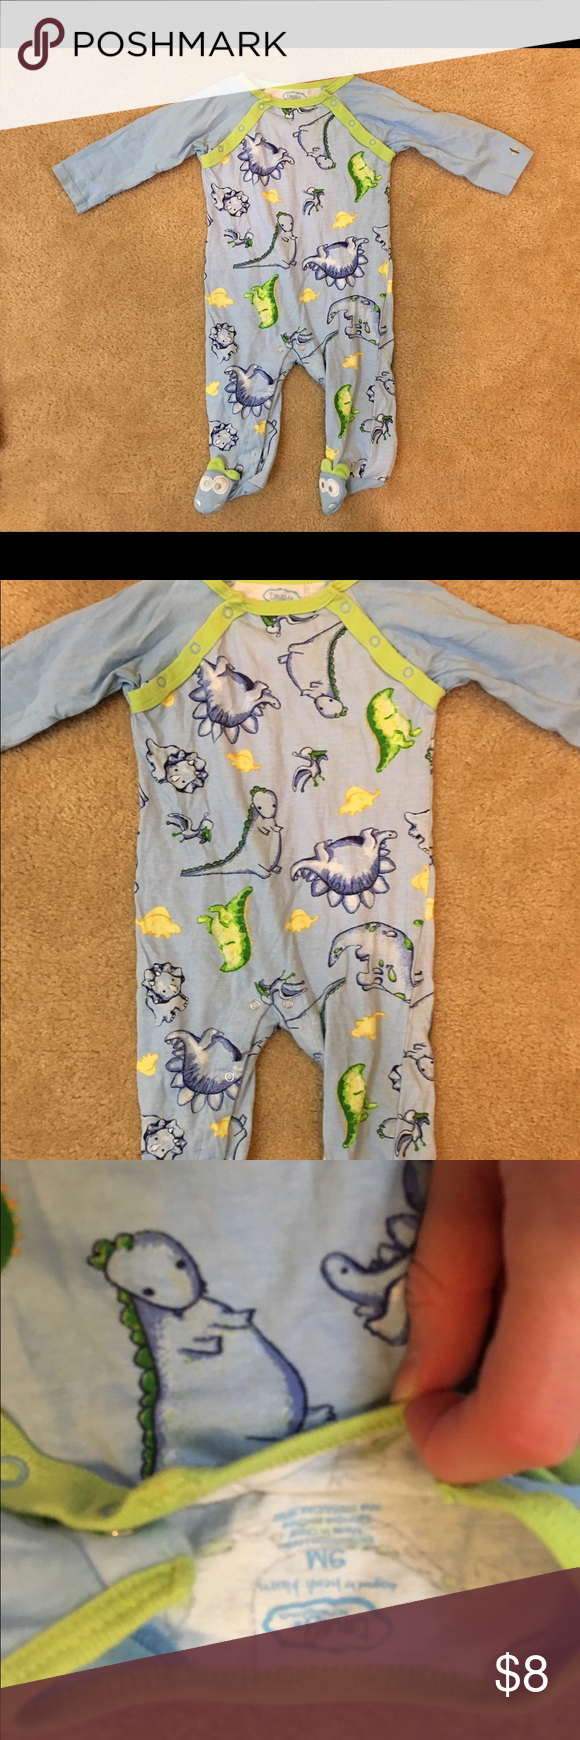 Truly Scrumptious dinosaur pajamas Baby boys truly scrumptious by Heidi Klum size 9 month footie pajamas only worn once! Pajamas